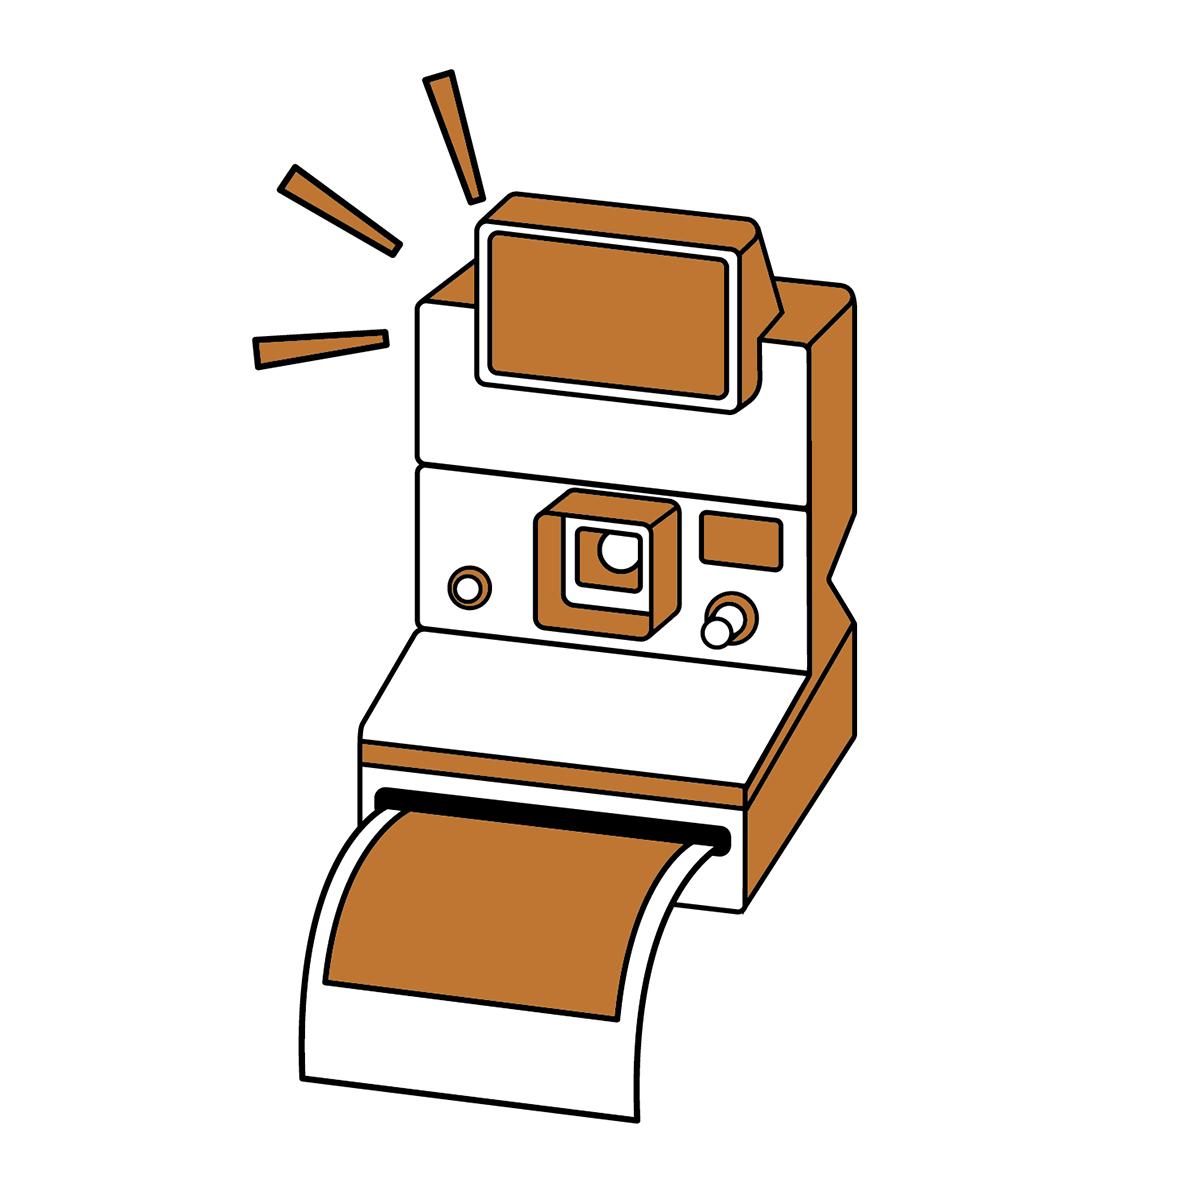 MIA35548 - Furniture Set